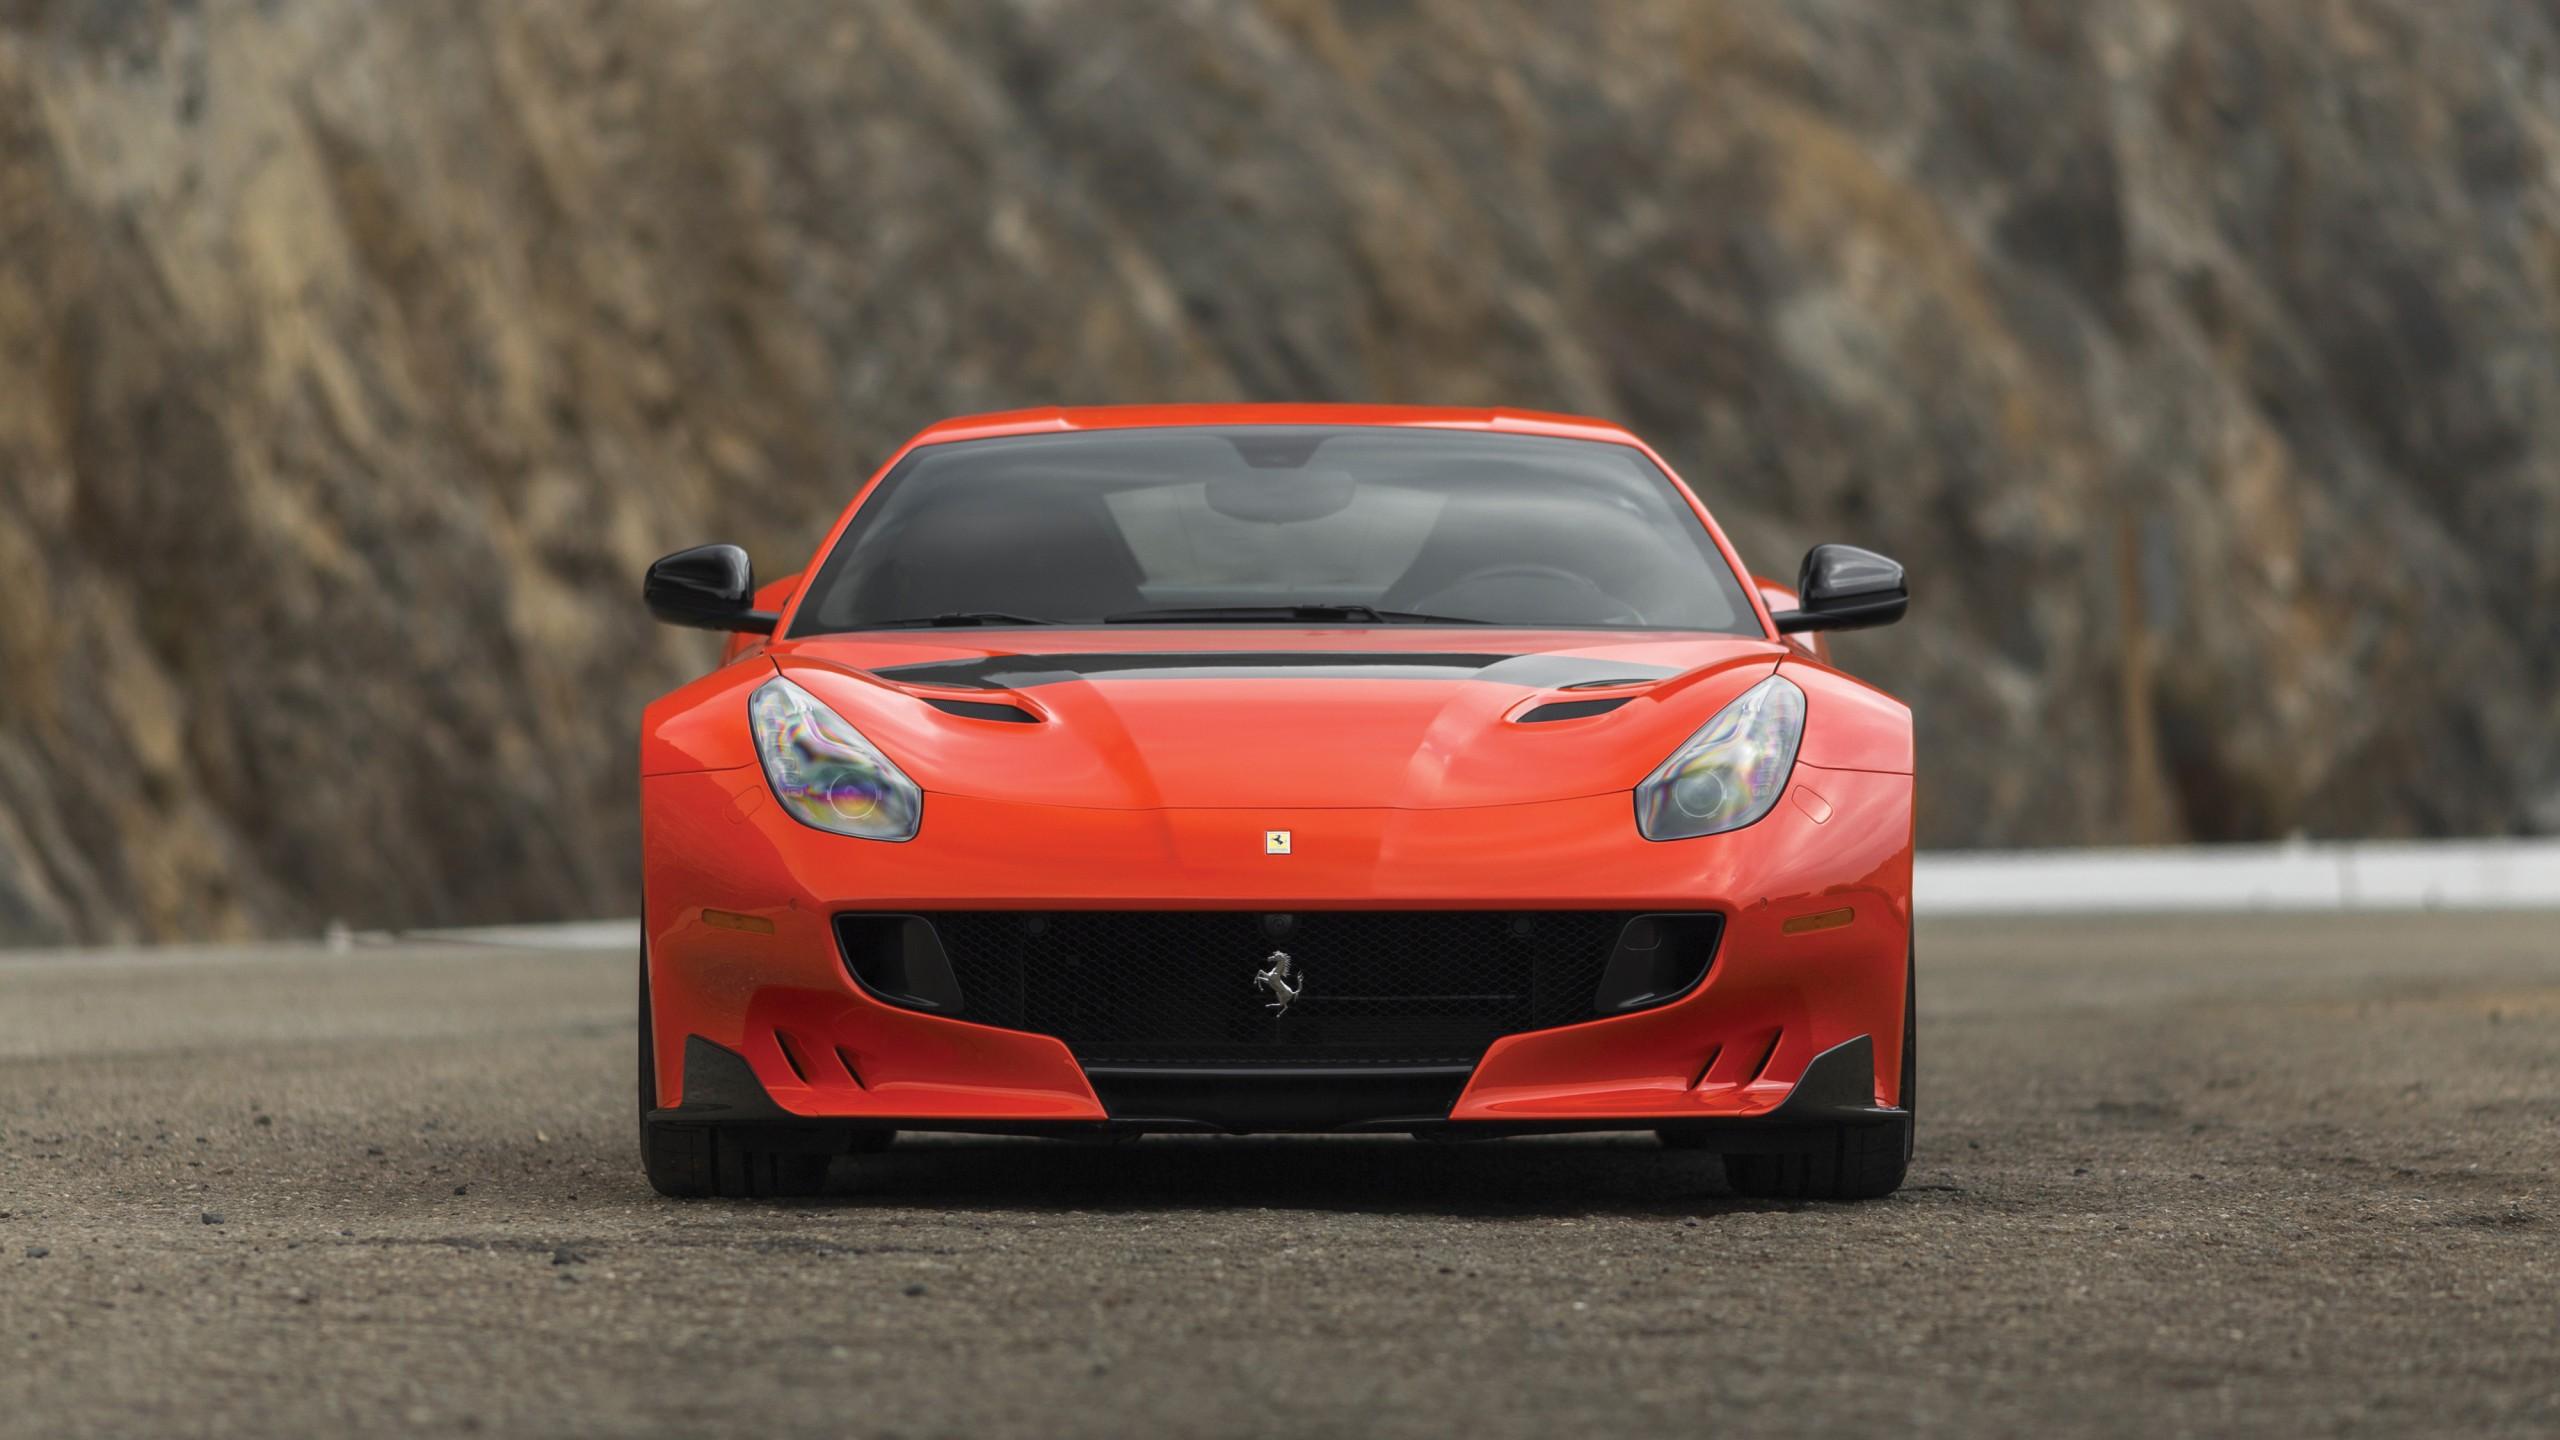 Ferrari Wallpaper 4K Pc